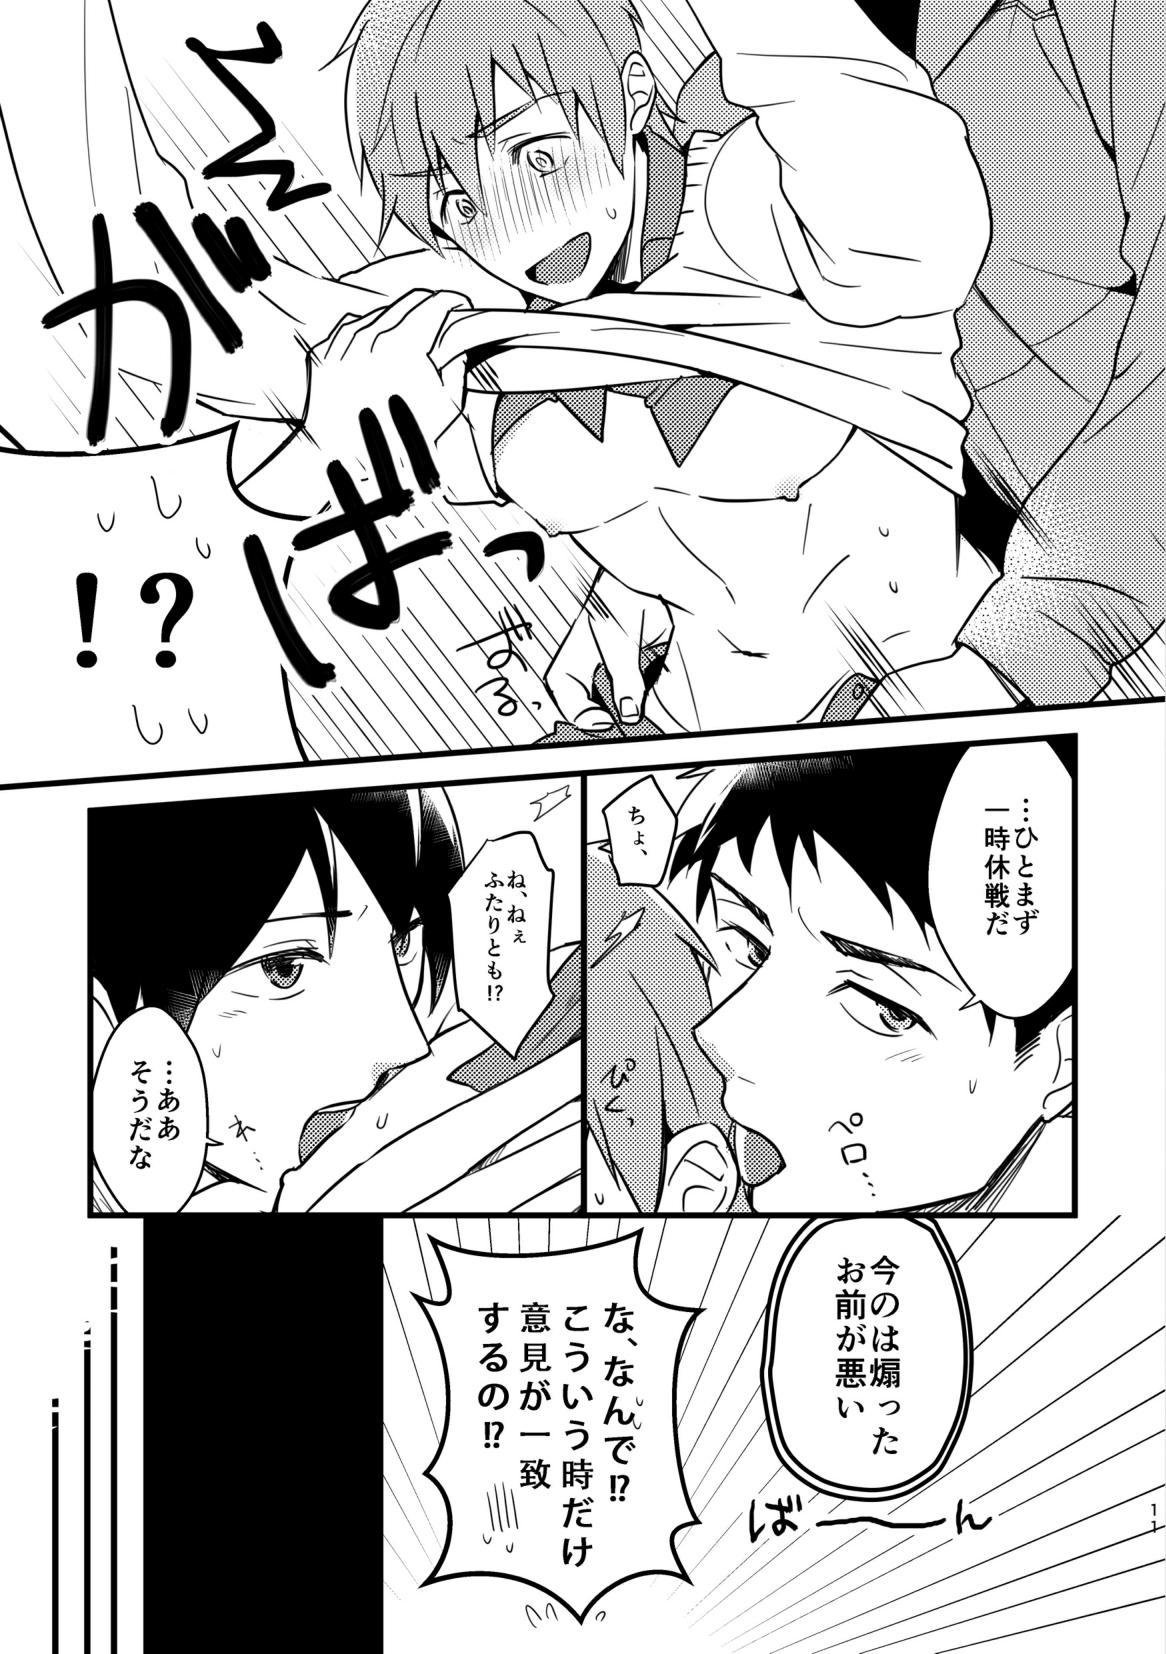 Kurokami Sandwich! 11